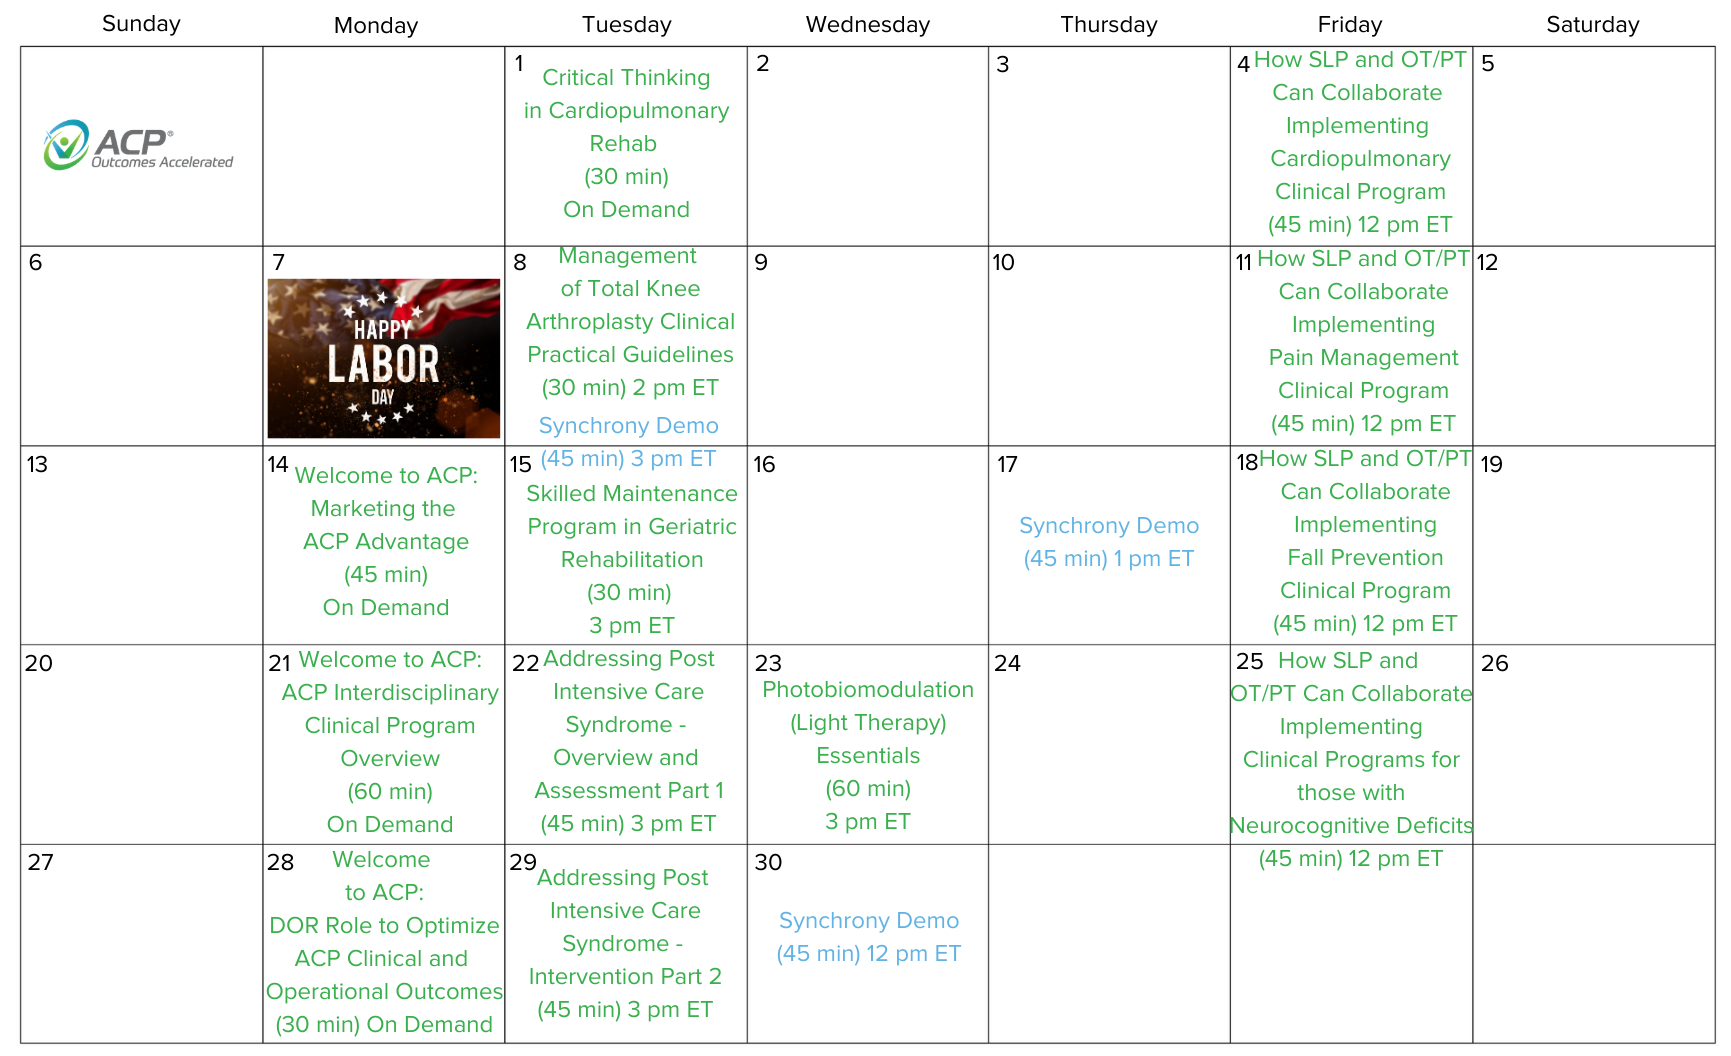 September Public Calendar_cropped